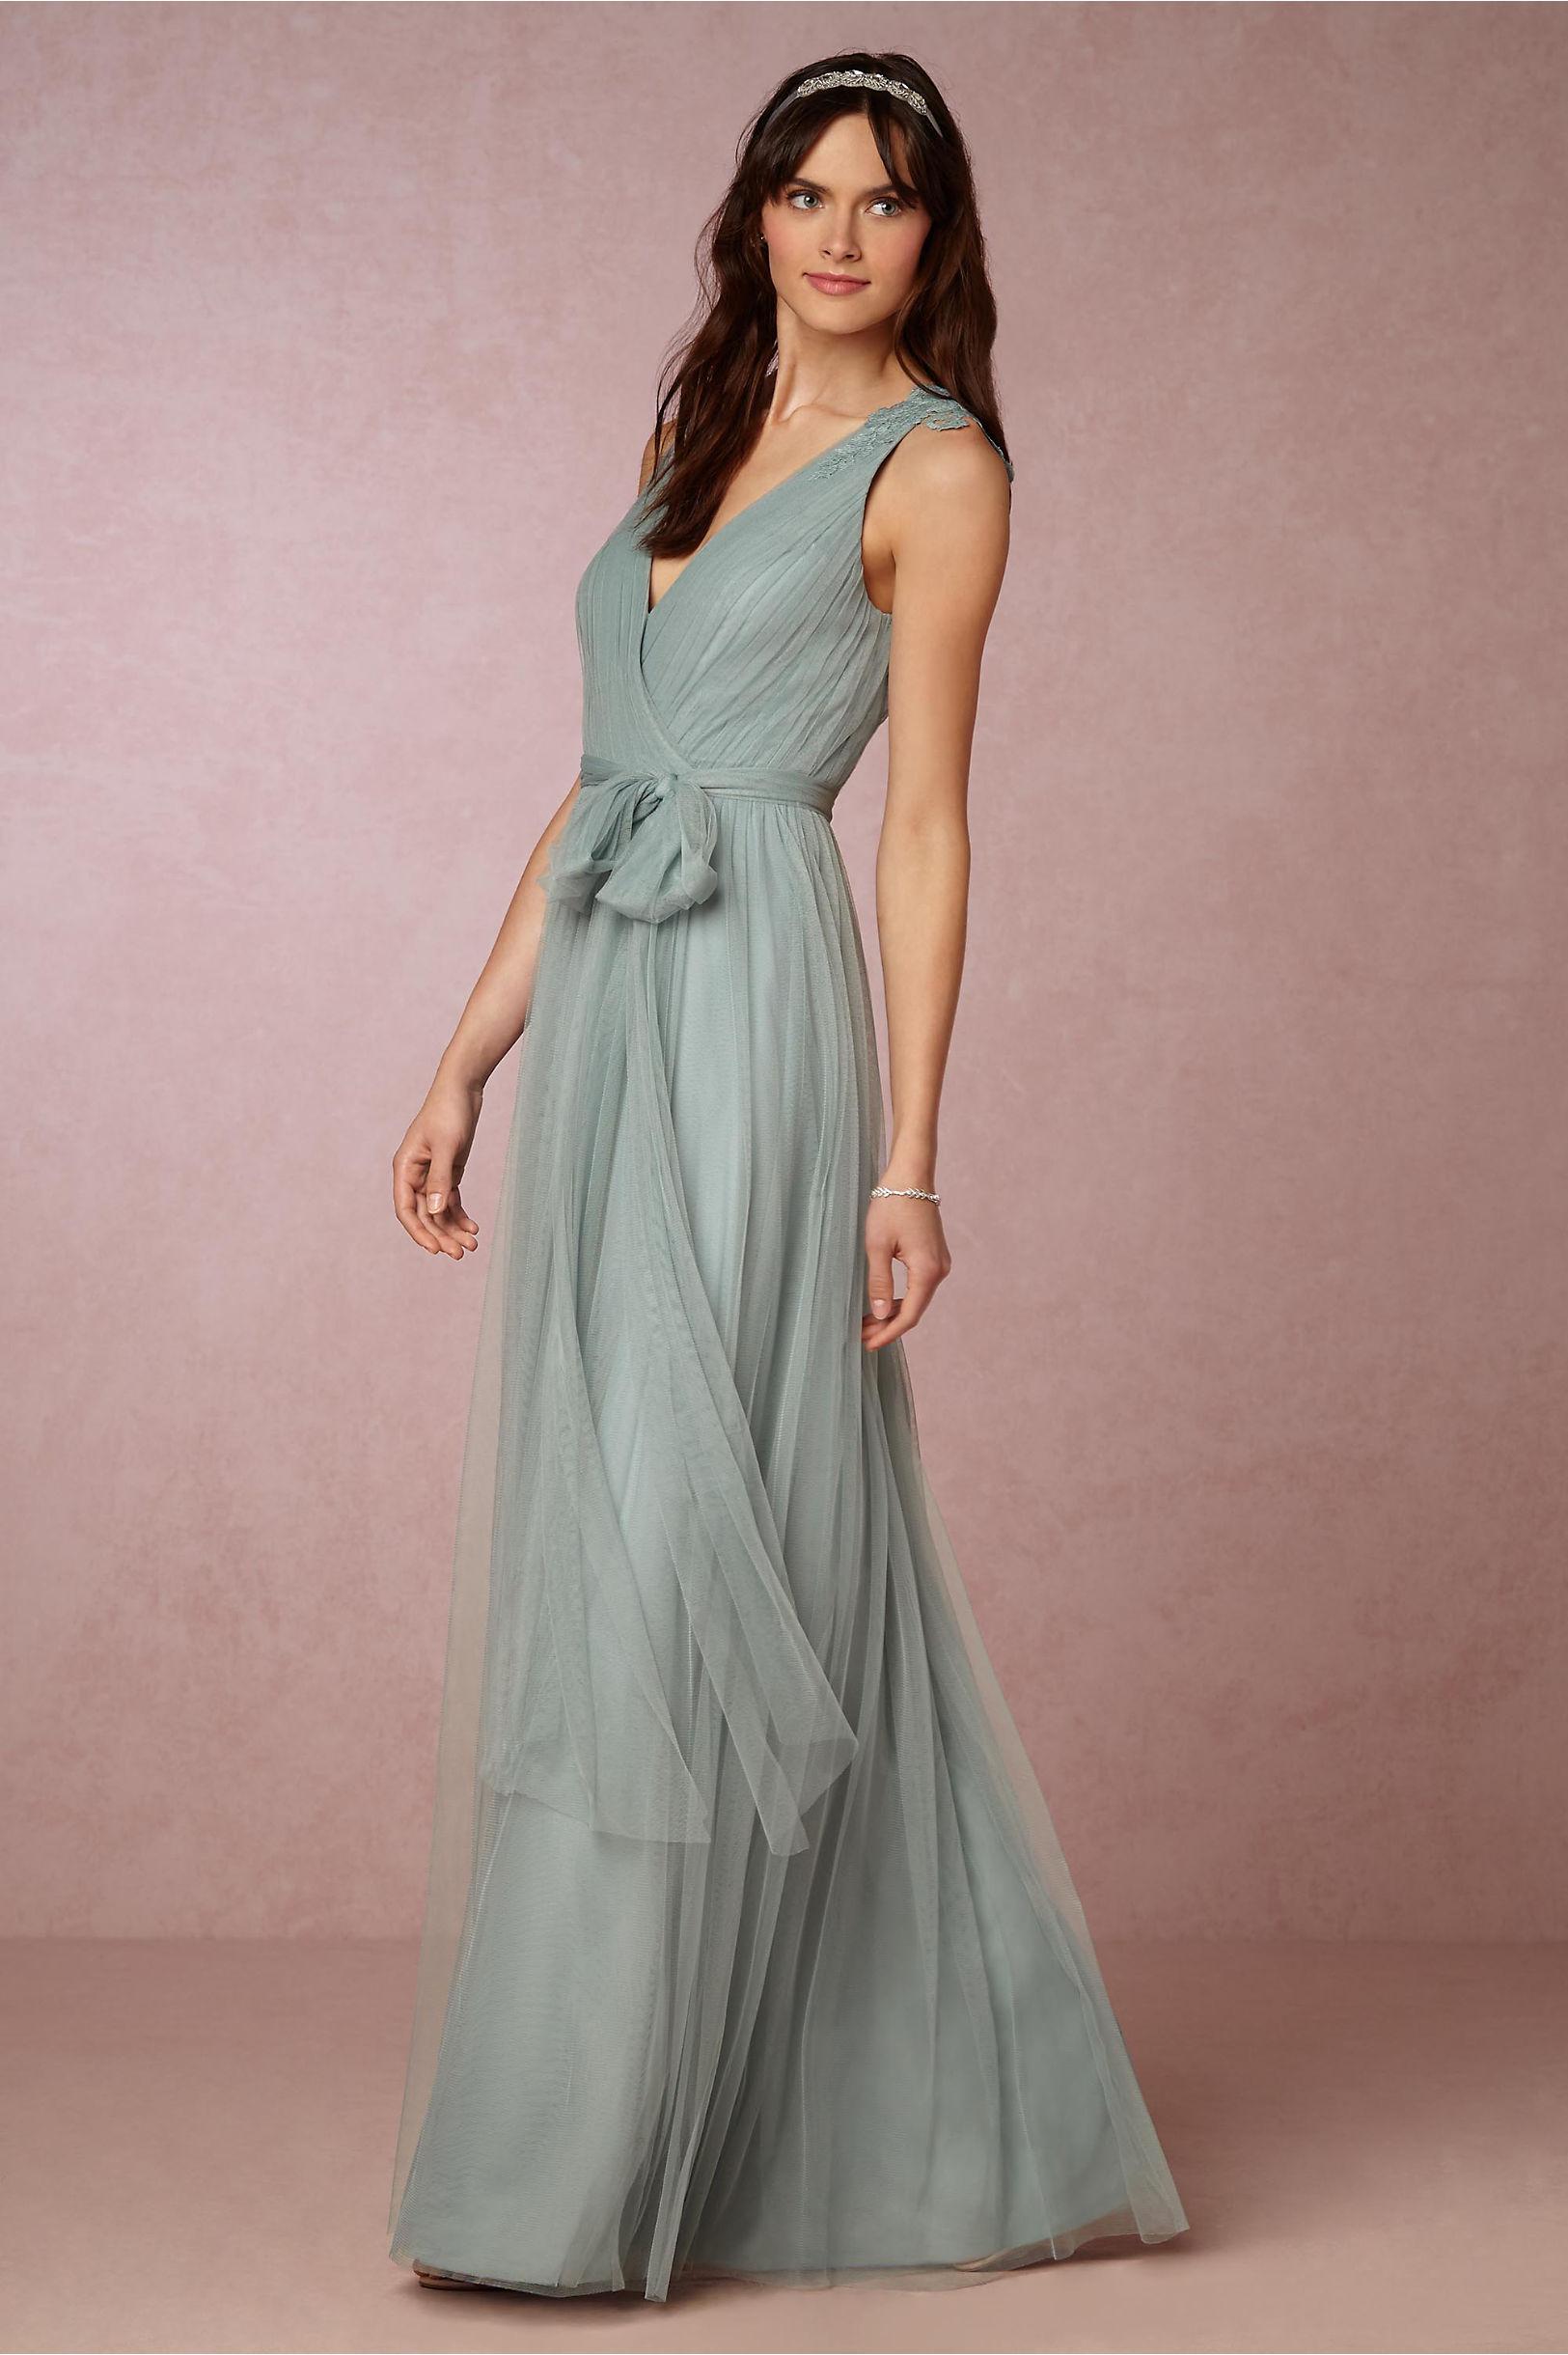 Pippa Dress in New | BHLDN